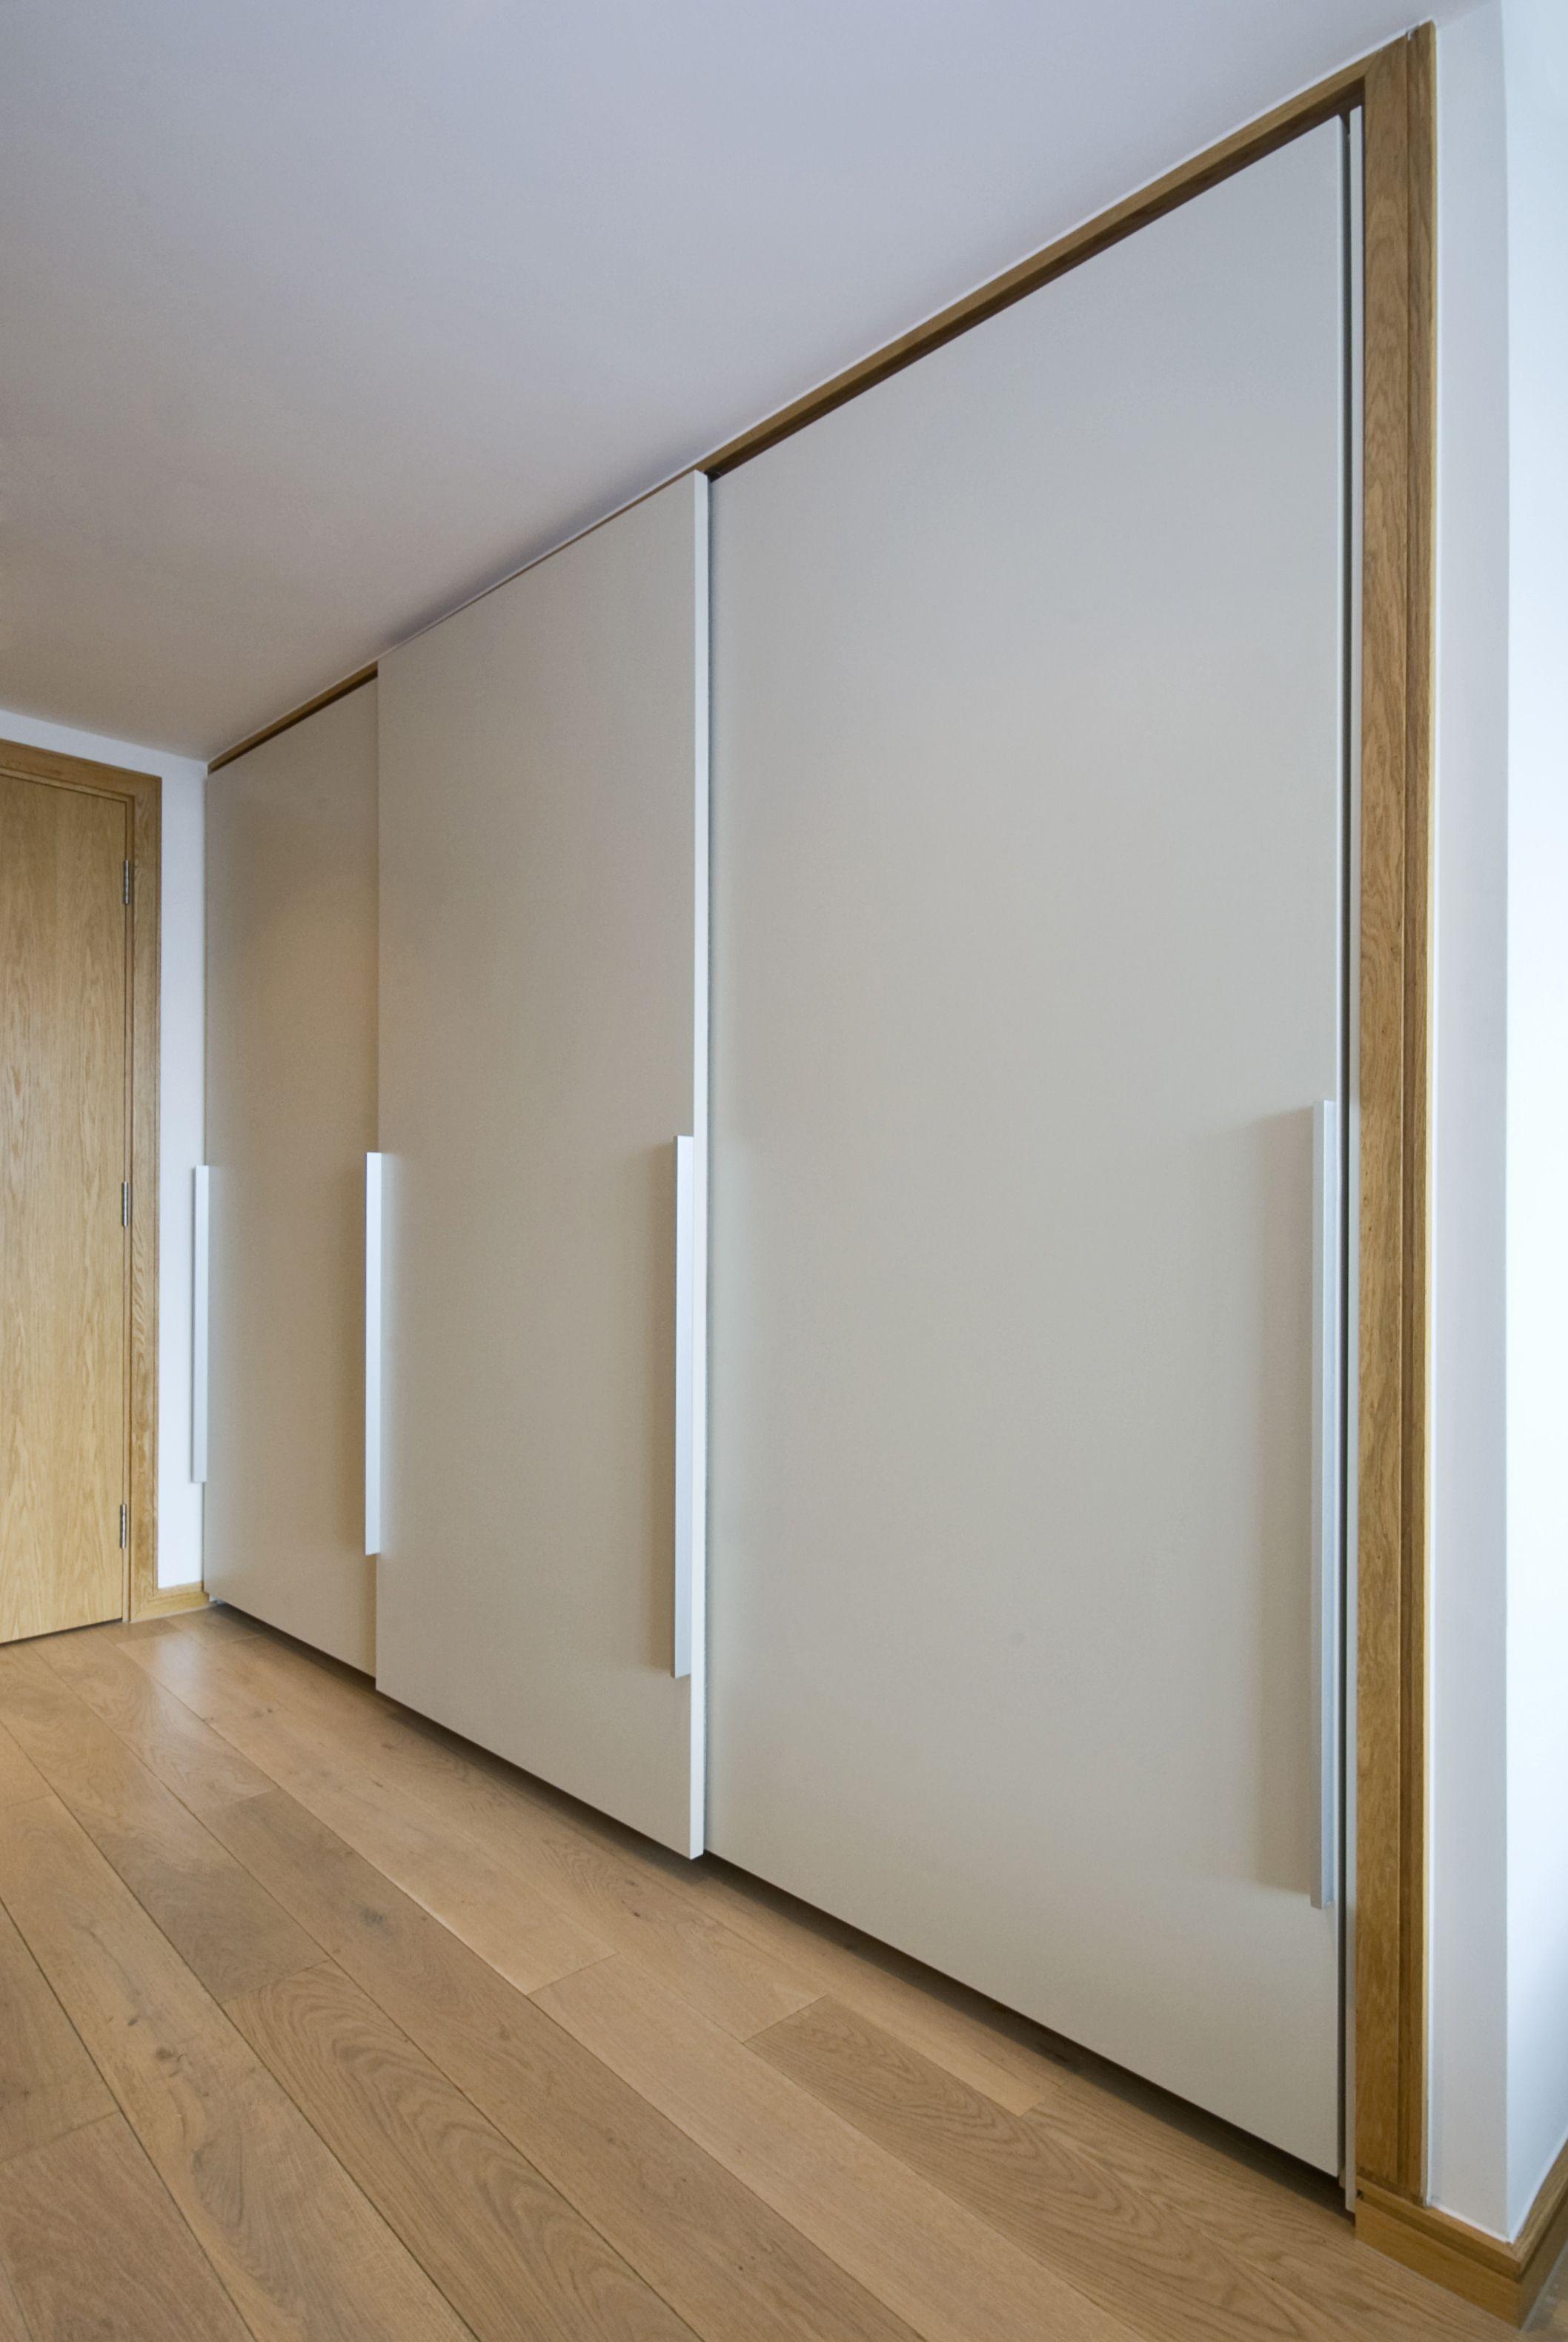 Wooden Sliding Wardrobe Doors Uk Google Search Closet